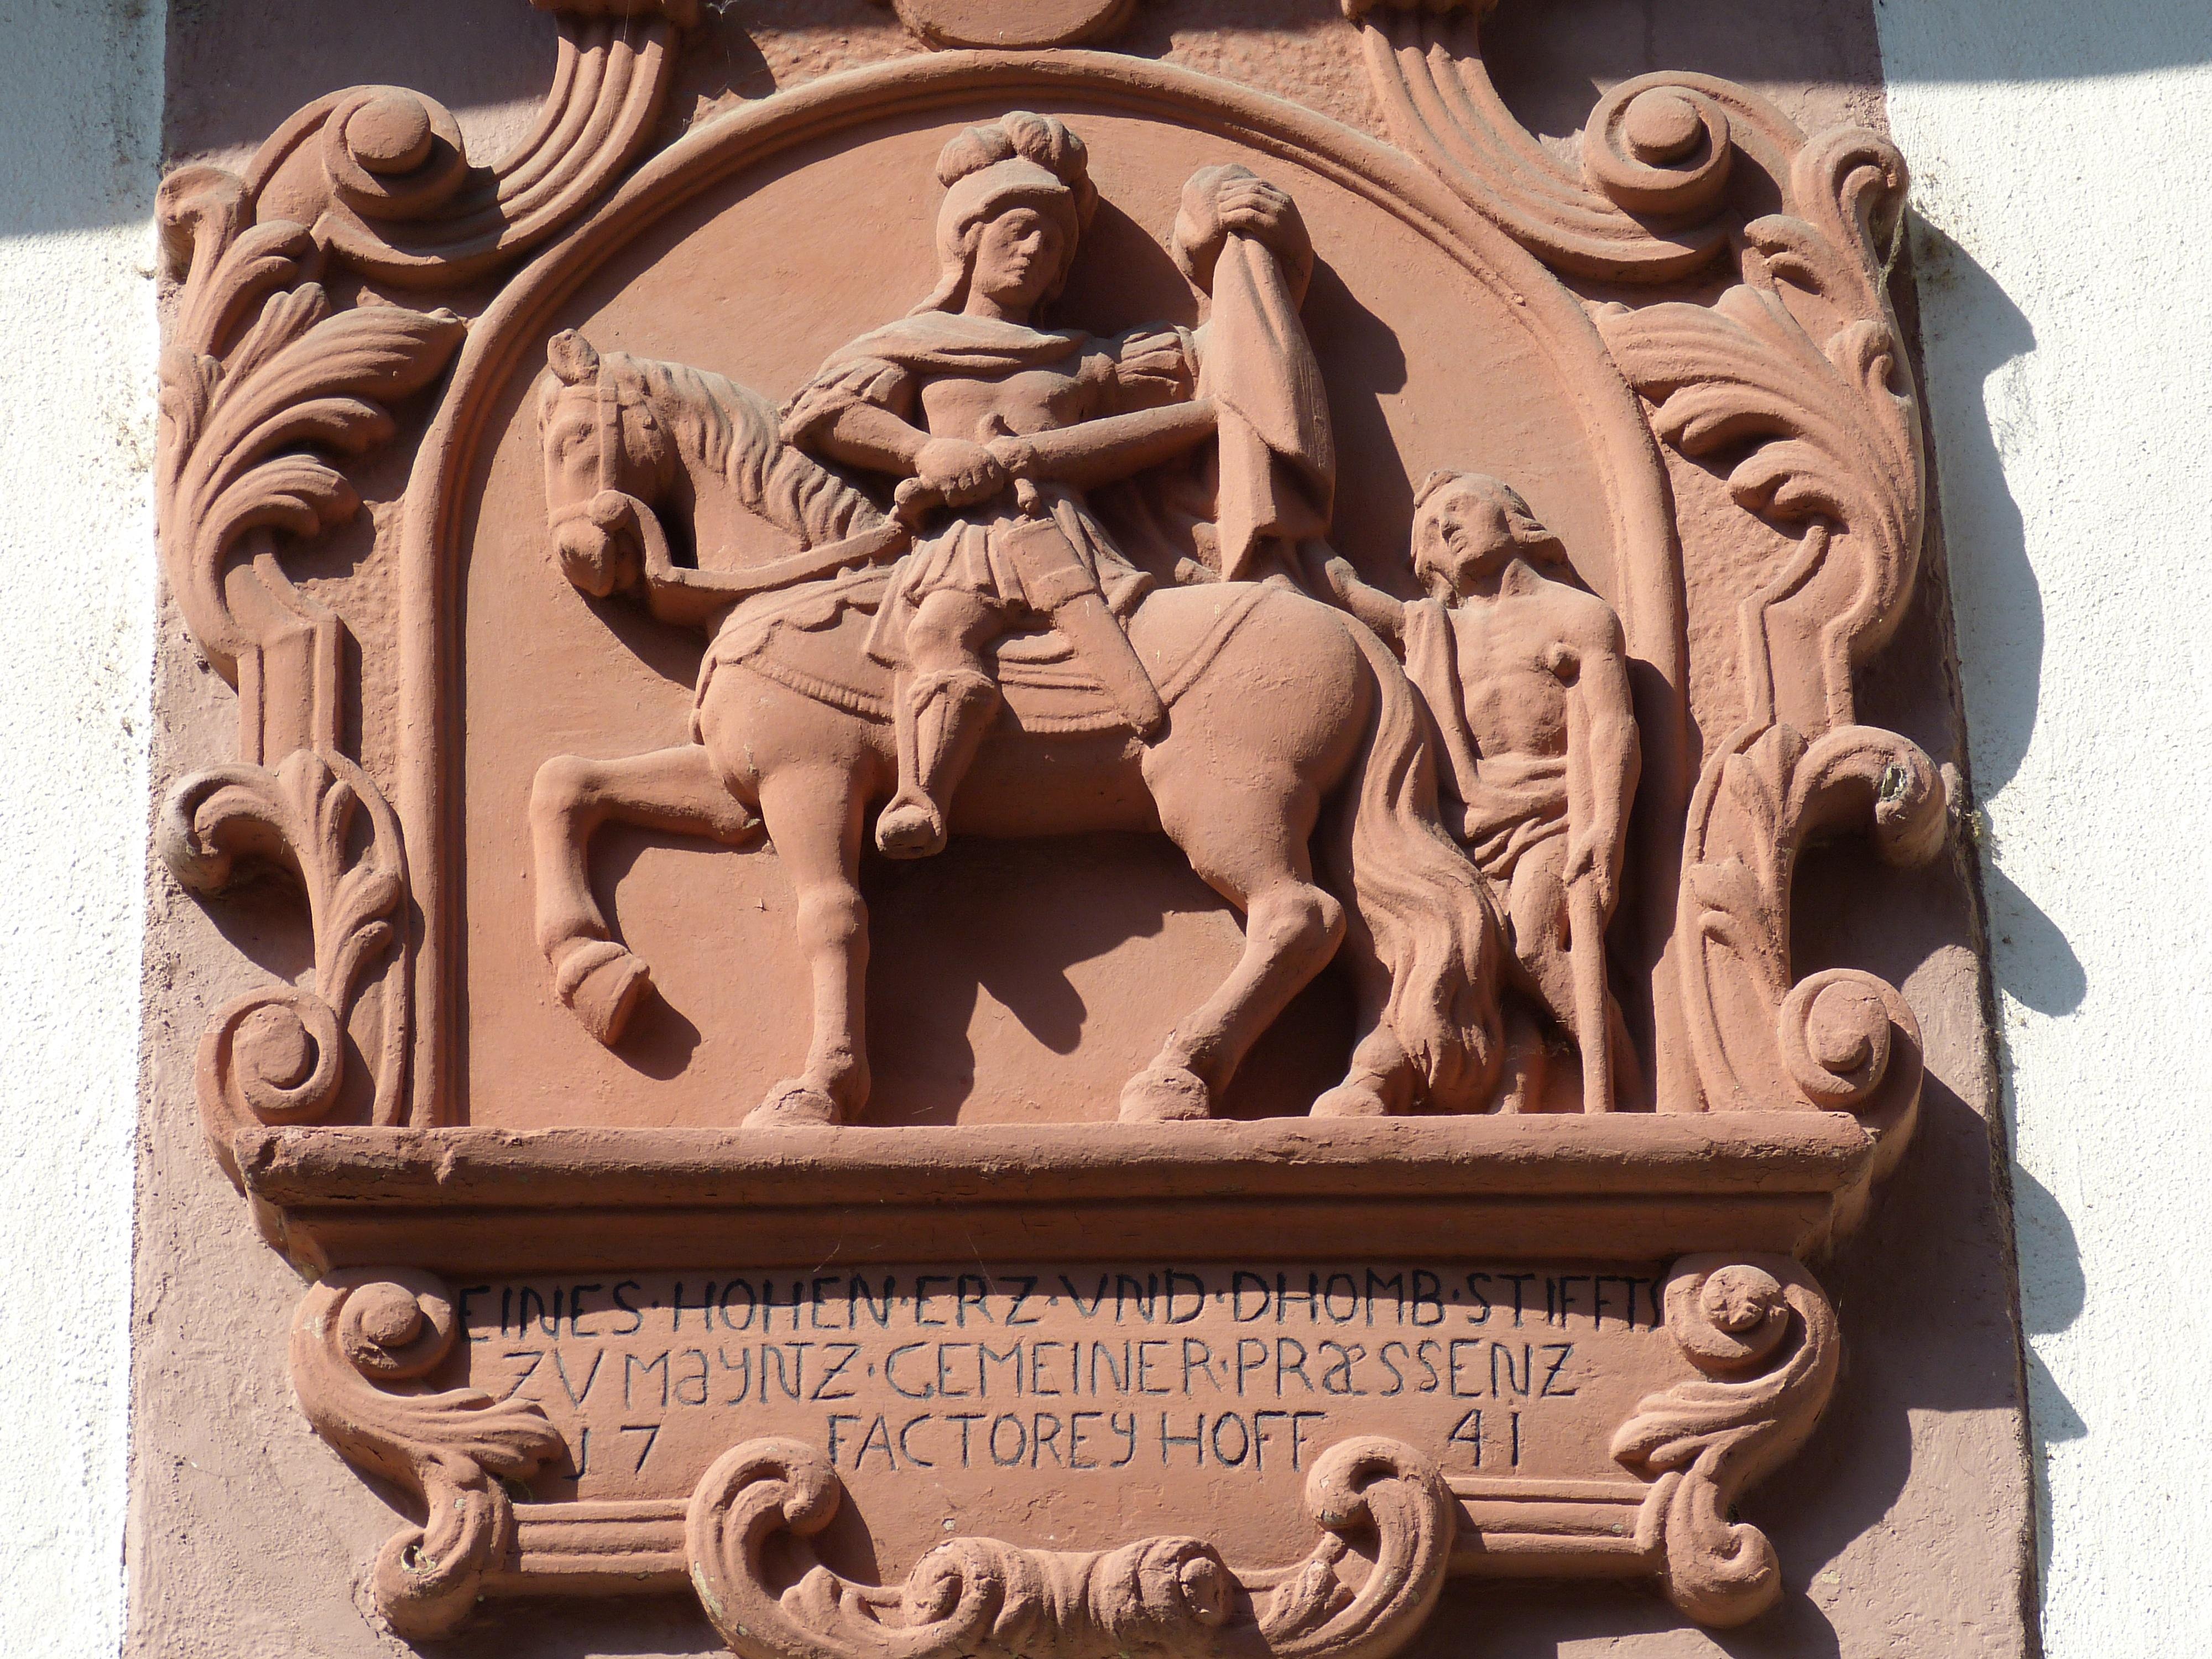 Fotos gratis : madera, Monumento, estatua, Iglesia, ayuda, escultura ...